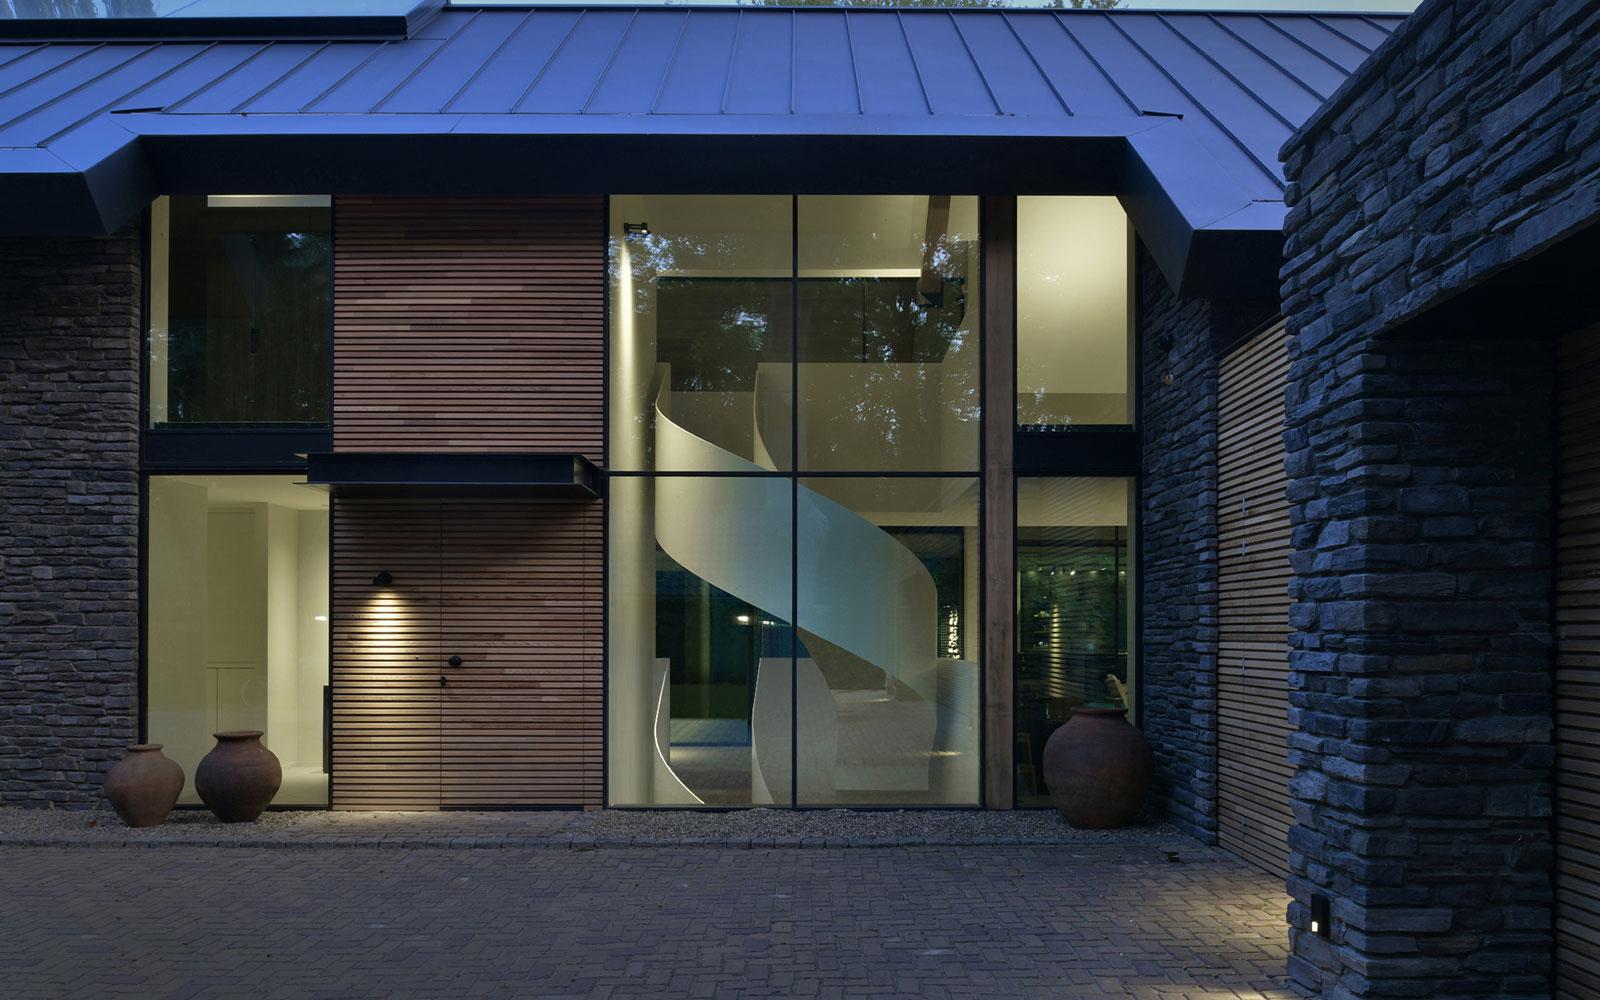 perfect view window, lichte woning, the art of living, ramen